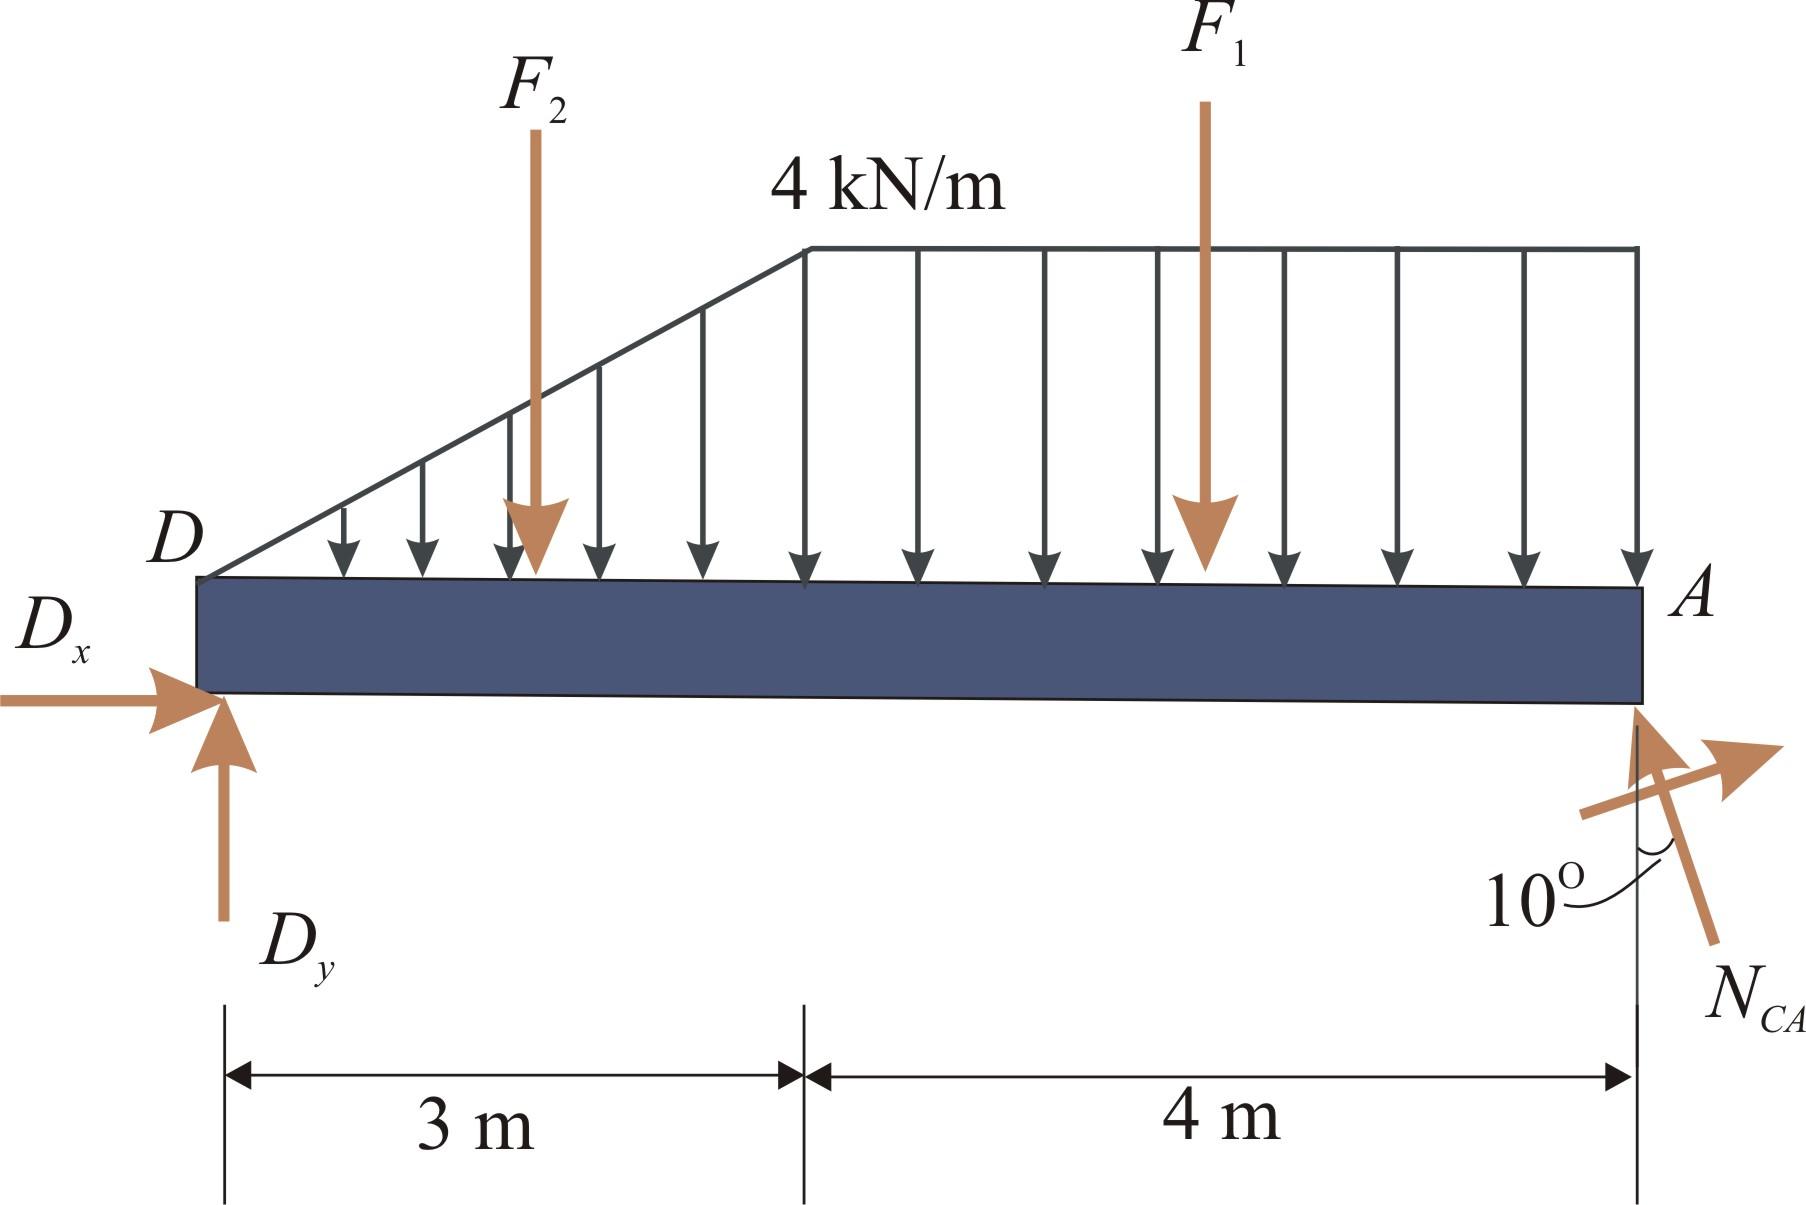 Engineering Mechanics 13th Edition Hibbler 859p Statics Free Body Diagram Draw The Of Beam